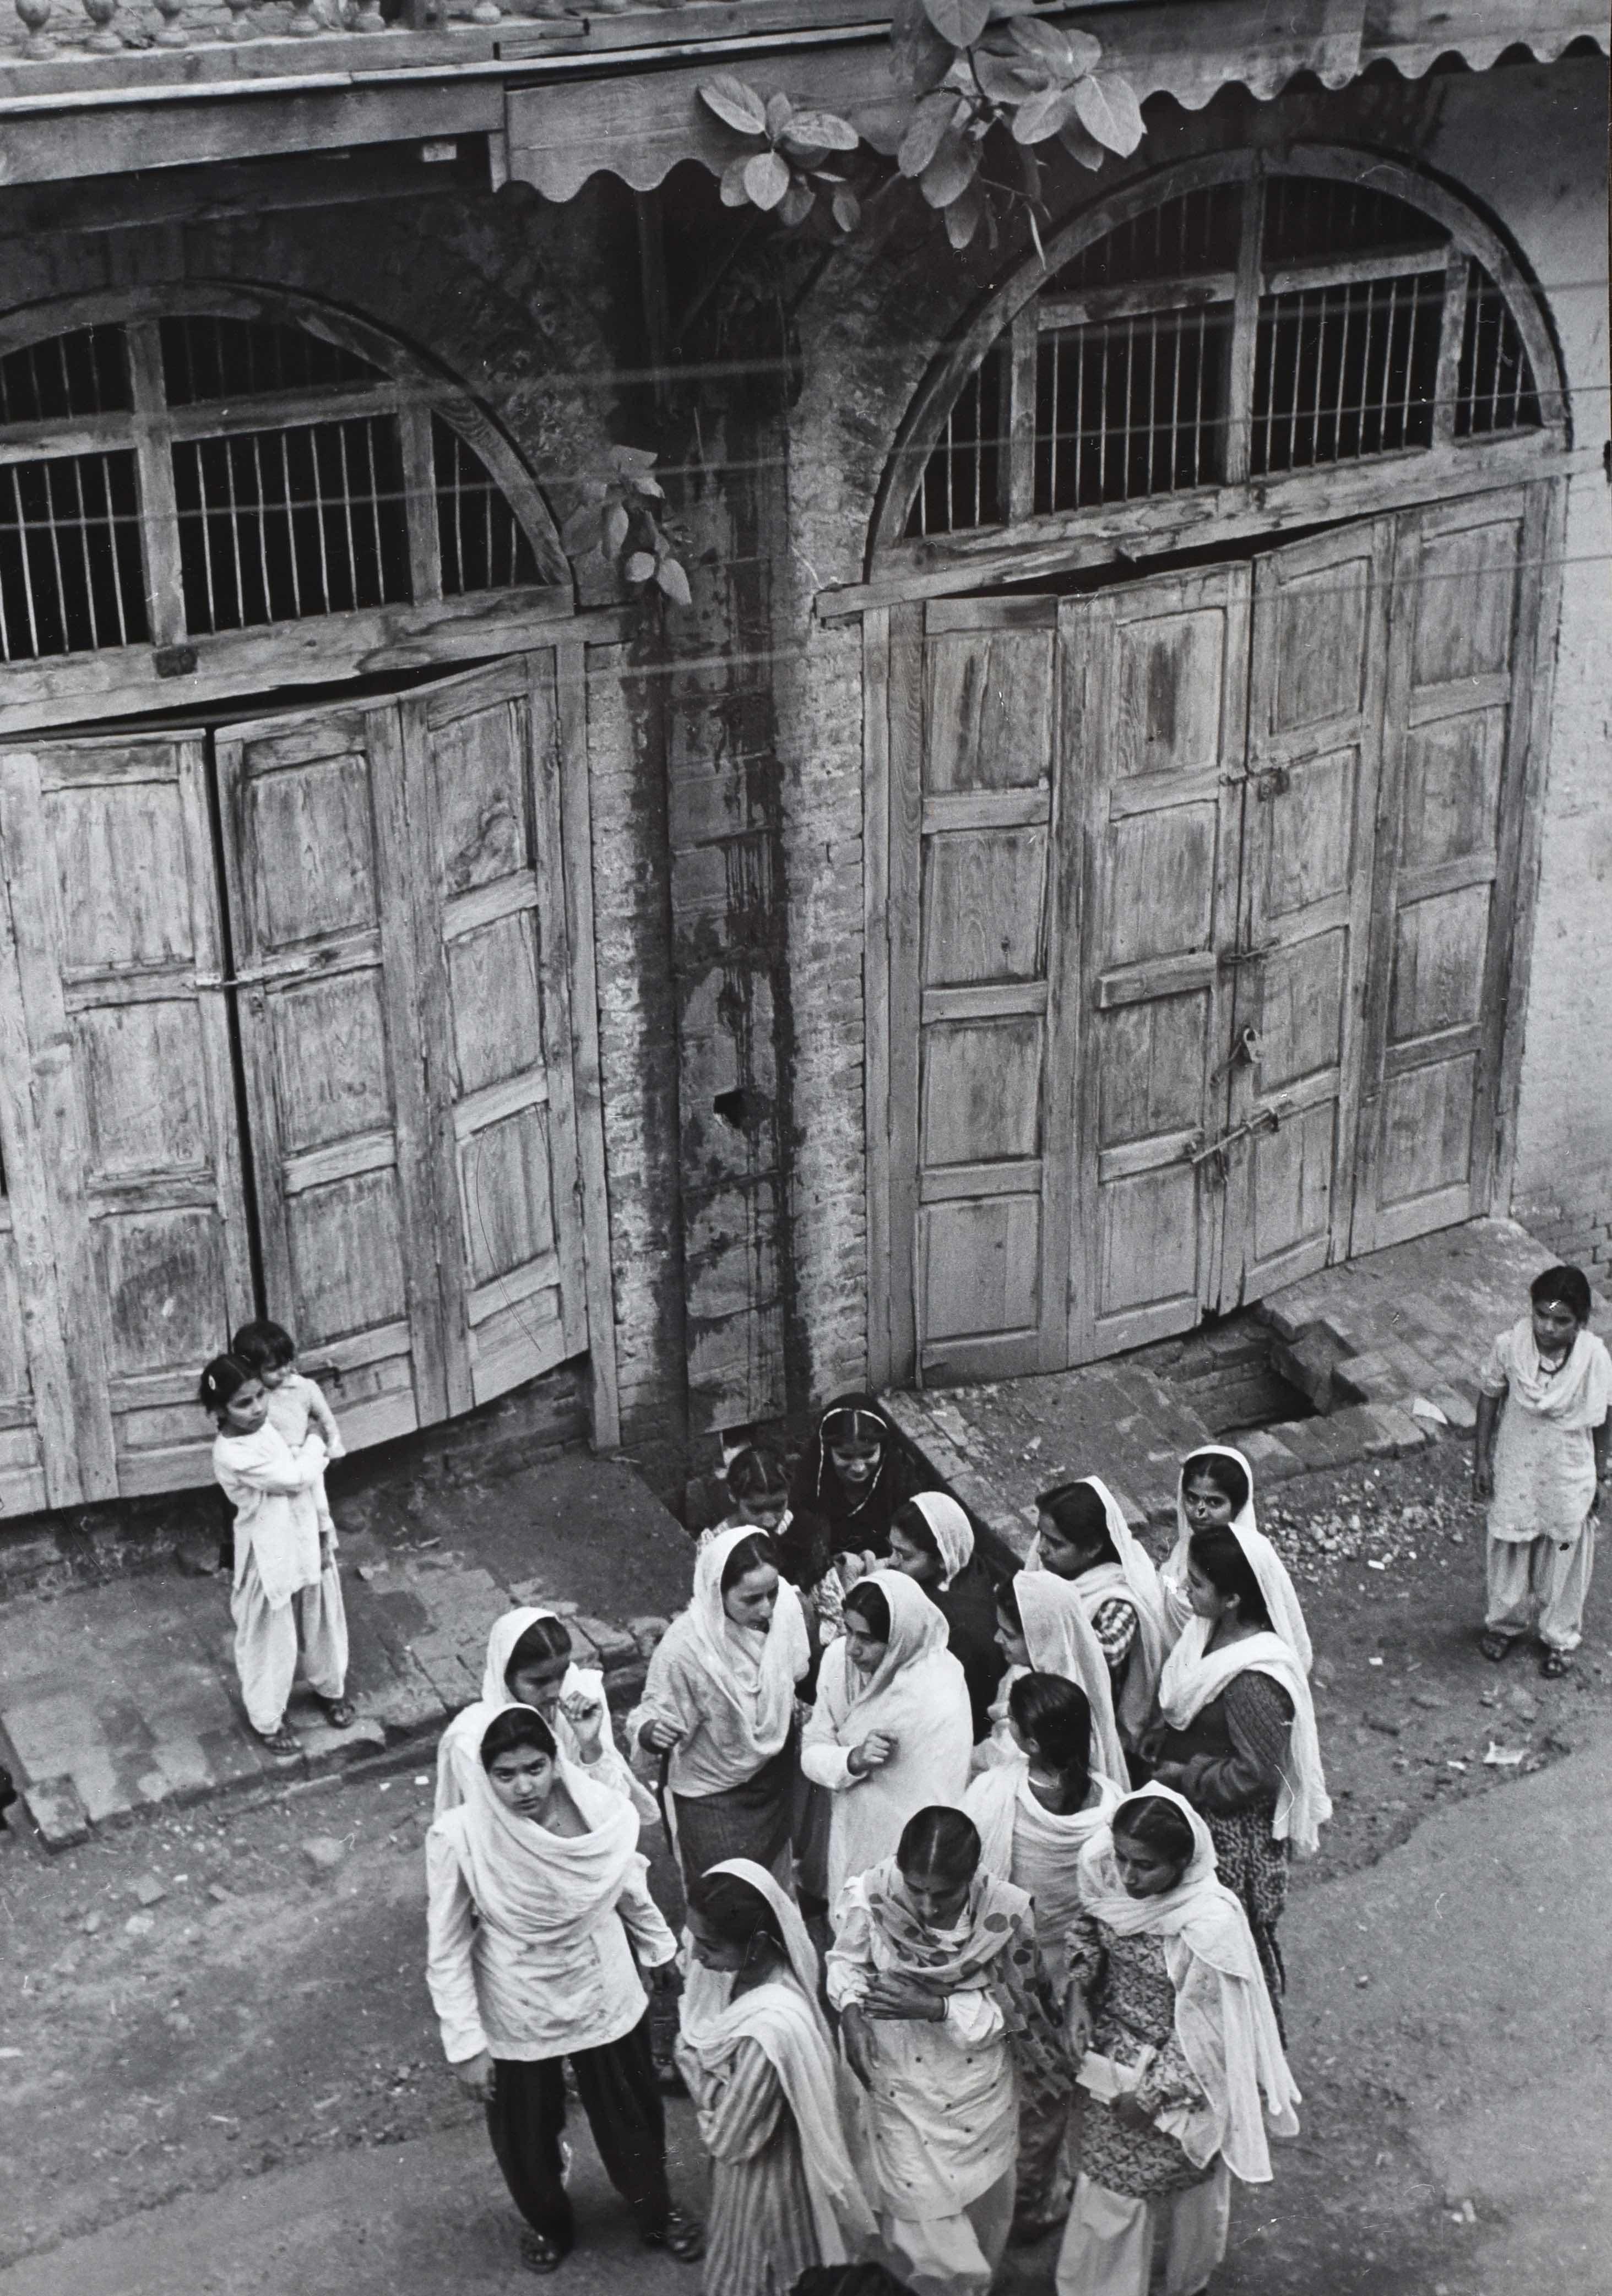 Women in Refugee Camp, Jammu, Kashmire, India, Vintage Gelatin Silver Print